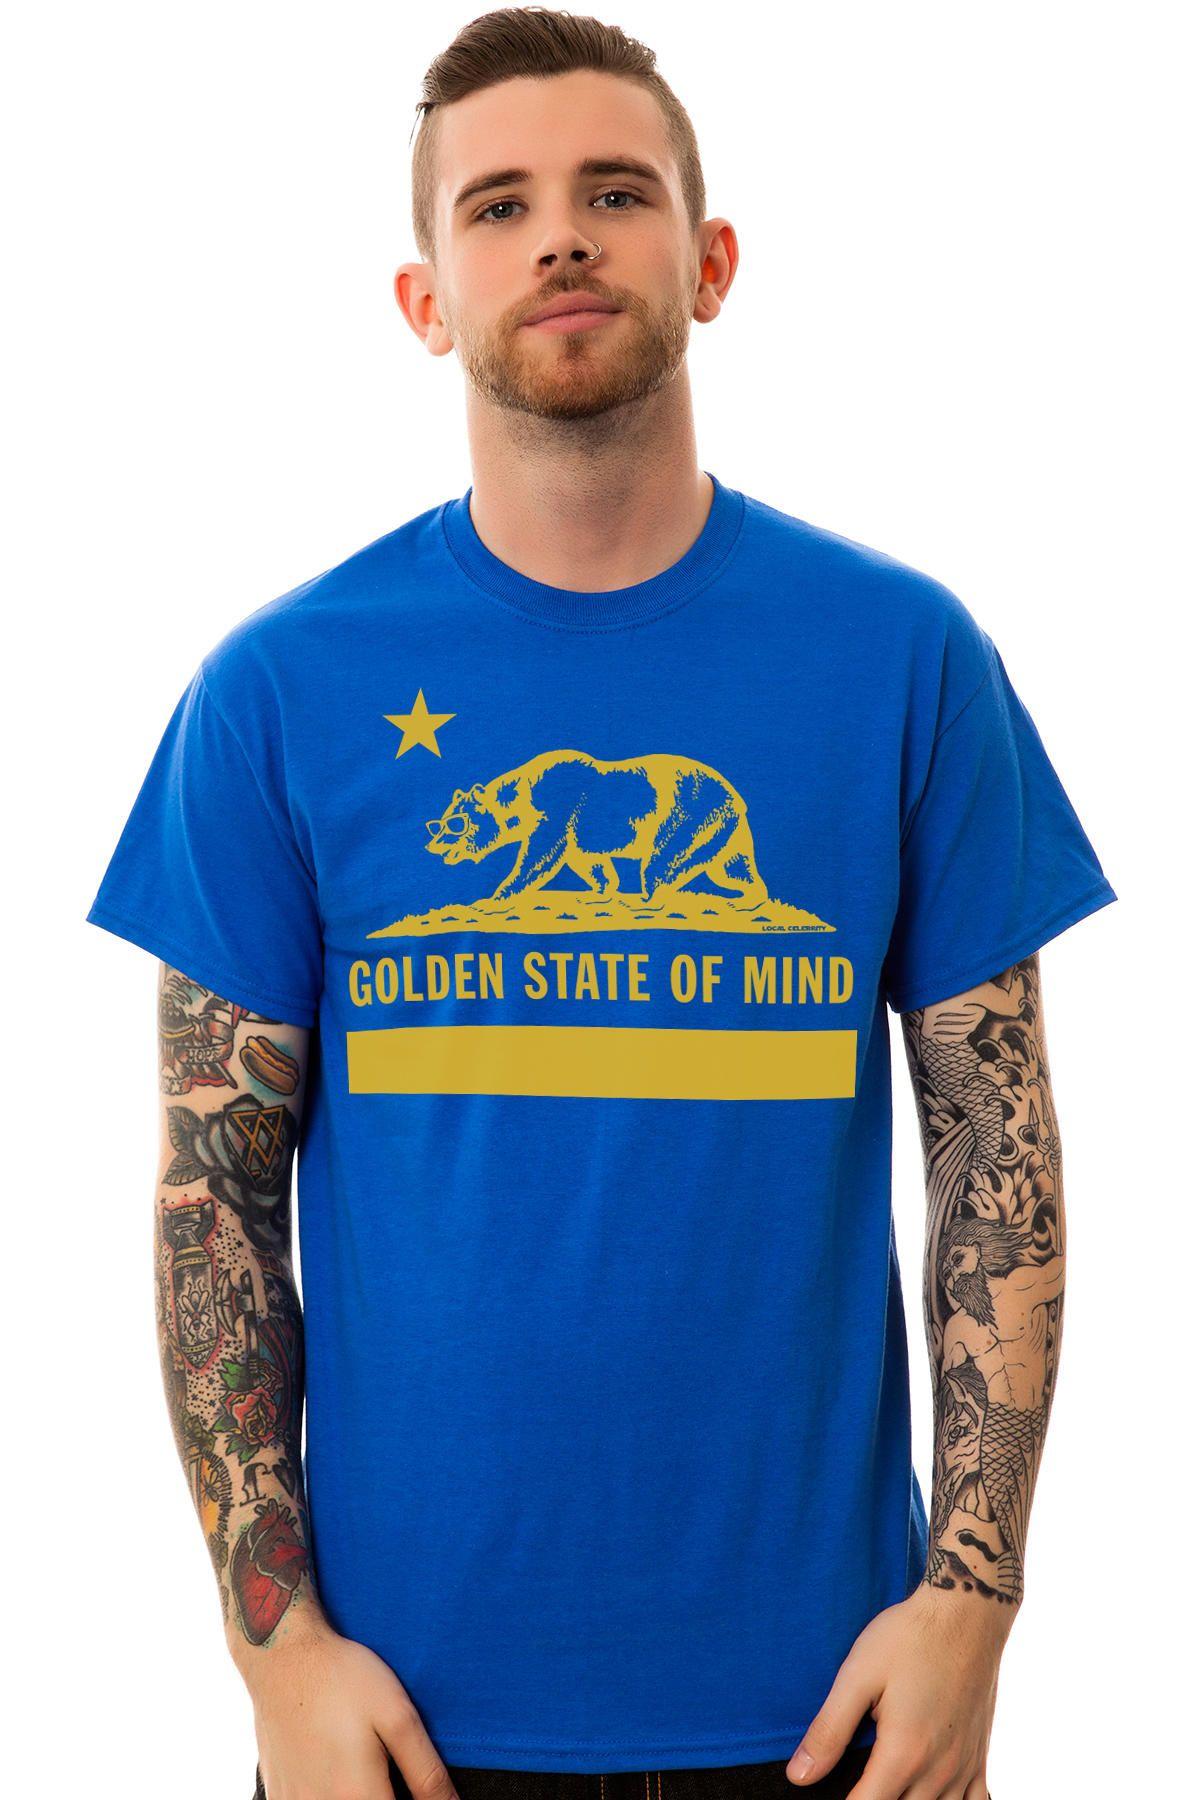 The Golden State of Mind Baseball Tee in Black - plndr.com